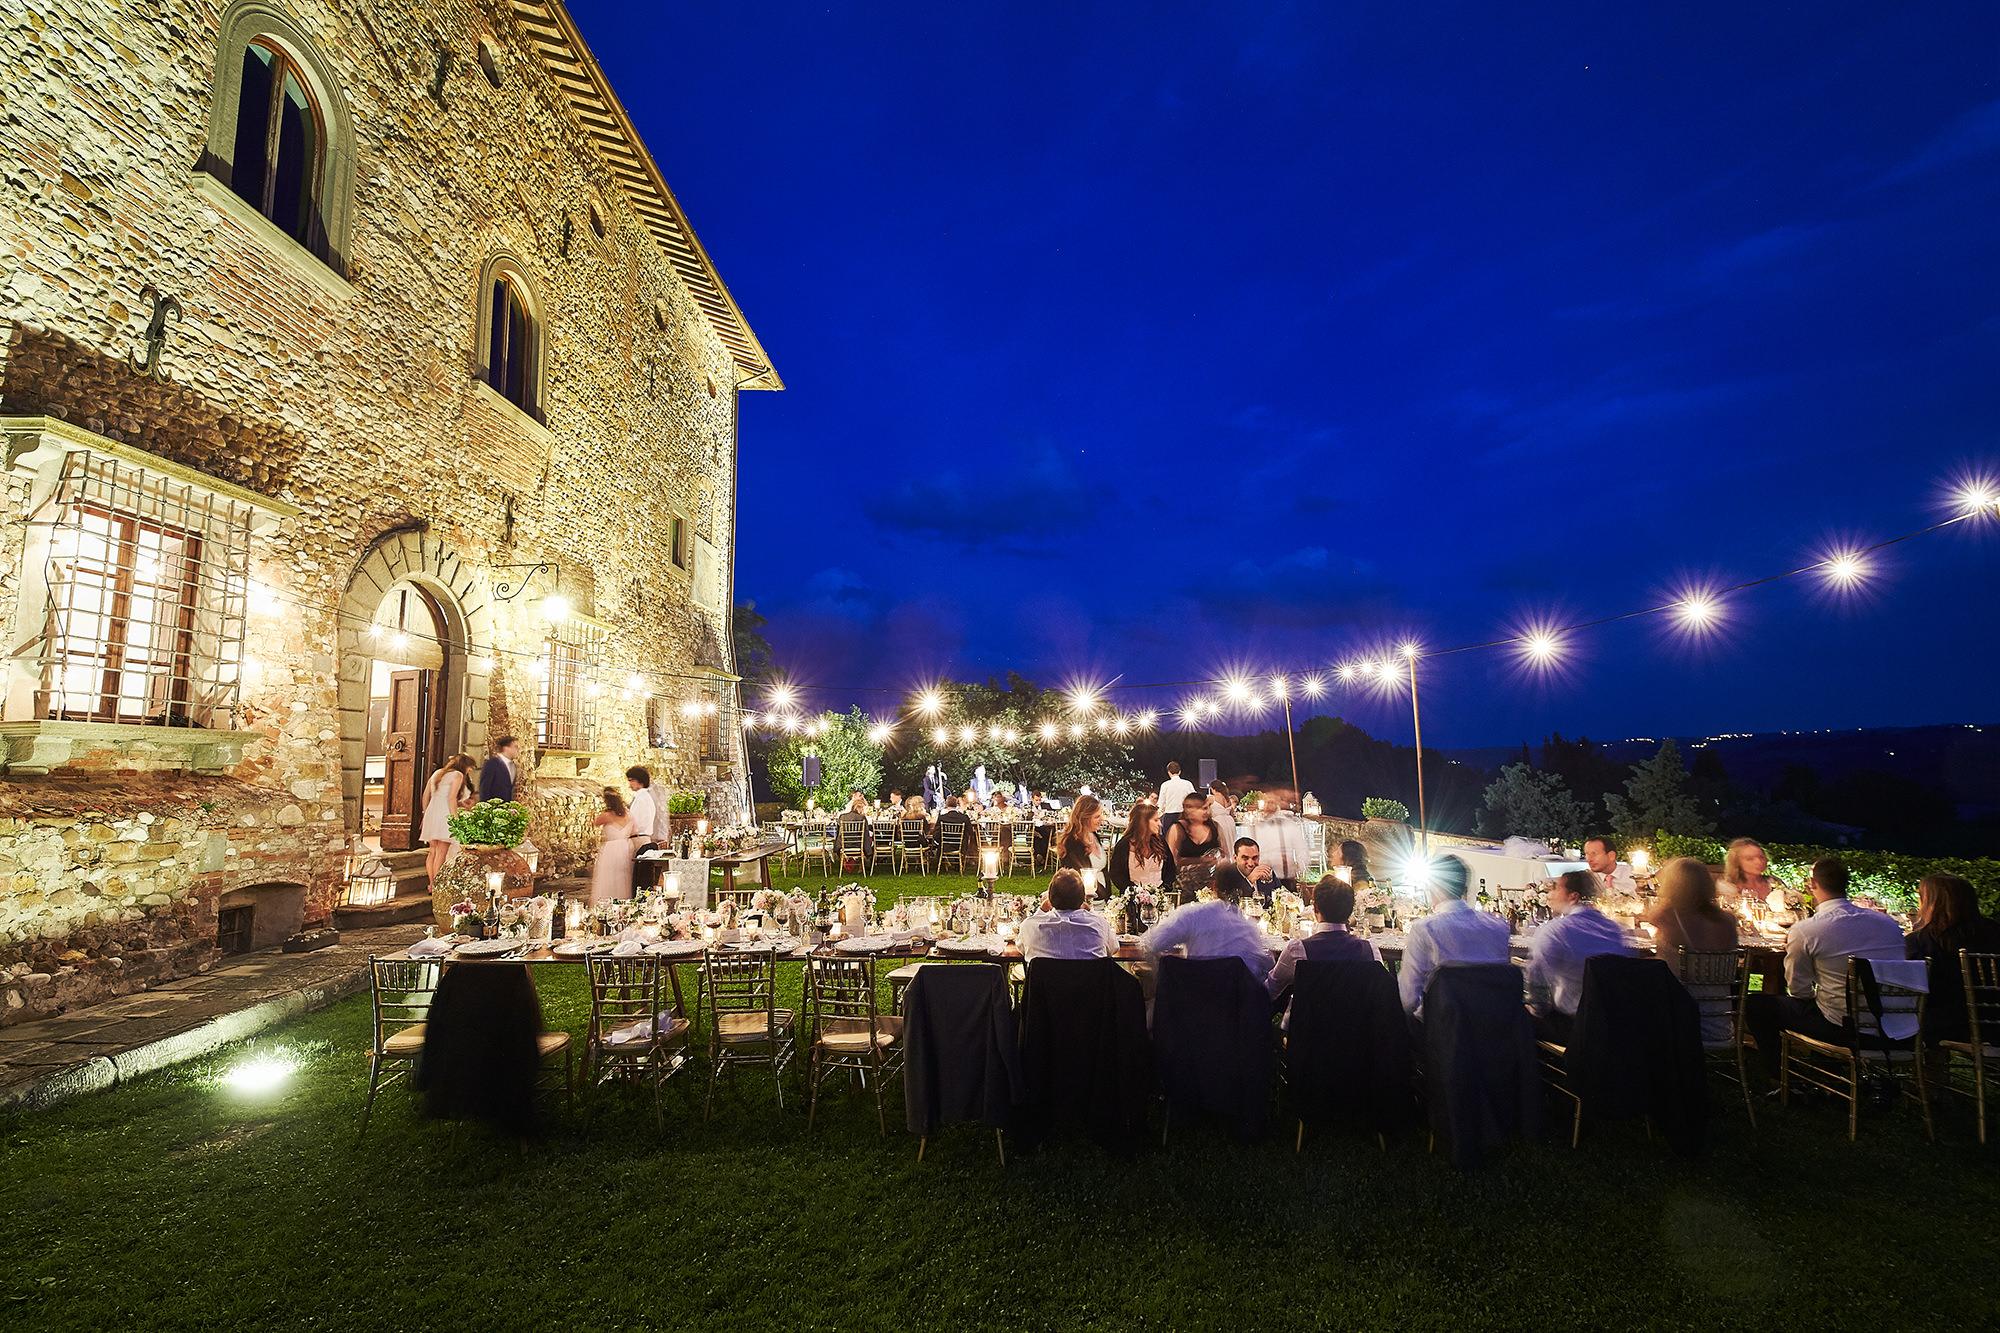 Wedding illumination with string lights